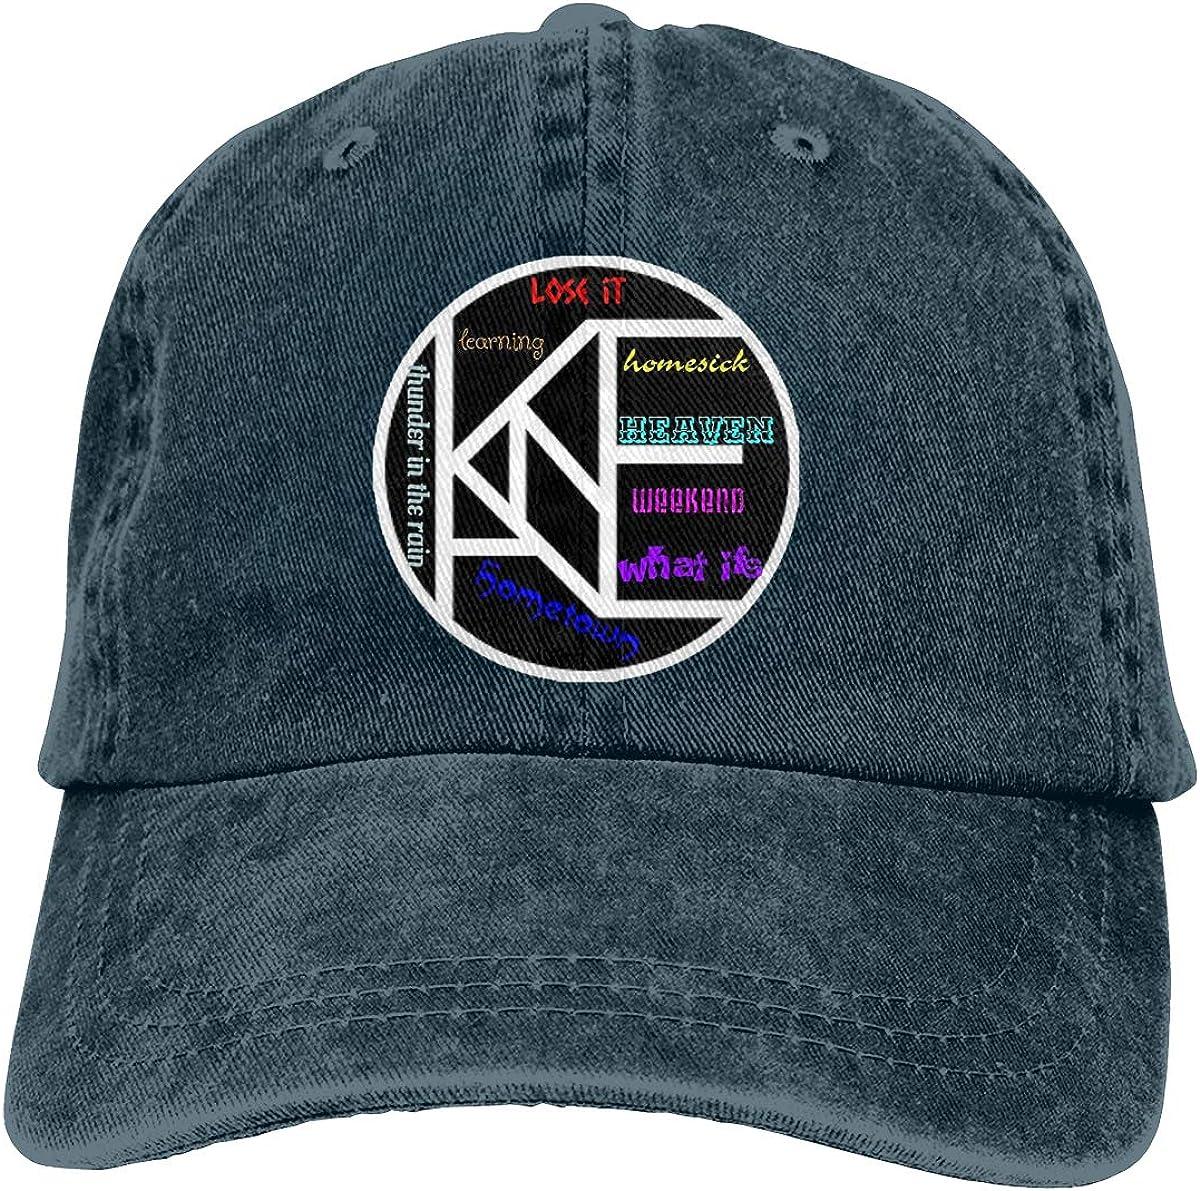 Monerla Ningpu Amazing Kane Brown Adjustable Denim Hats